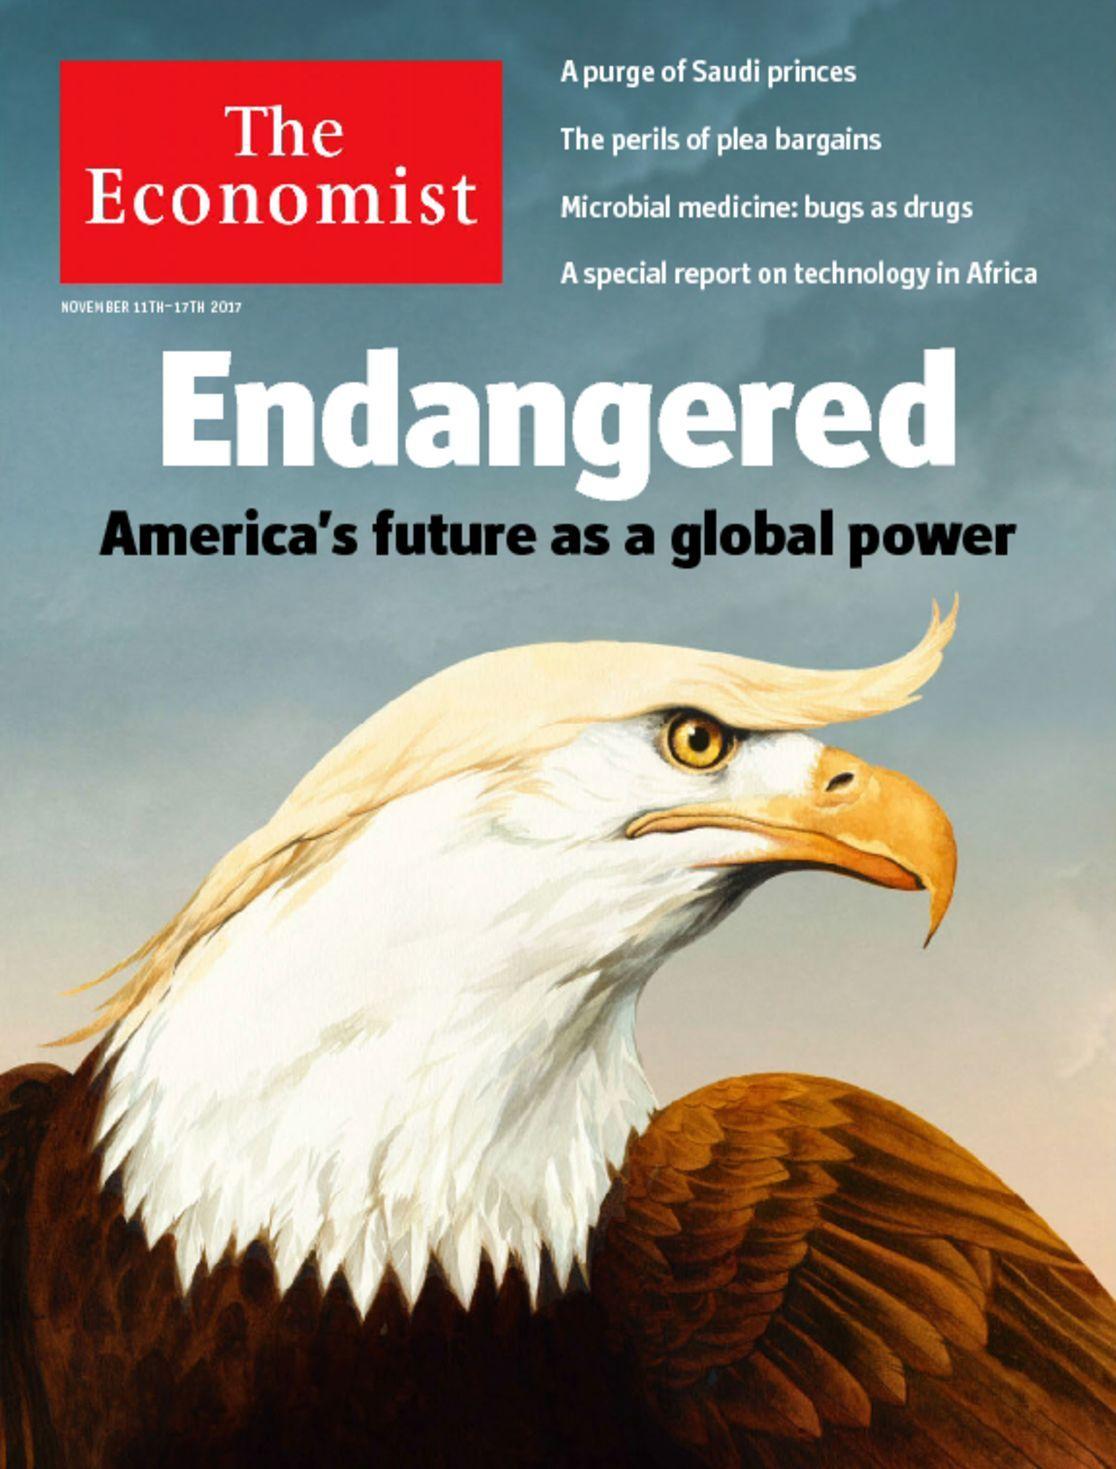 Best Price for The Economist Magazine Subscription